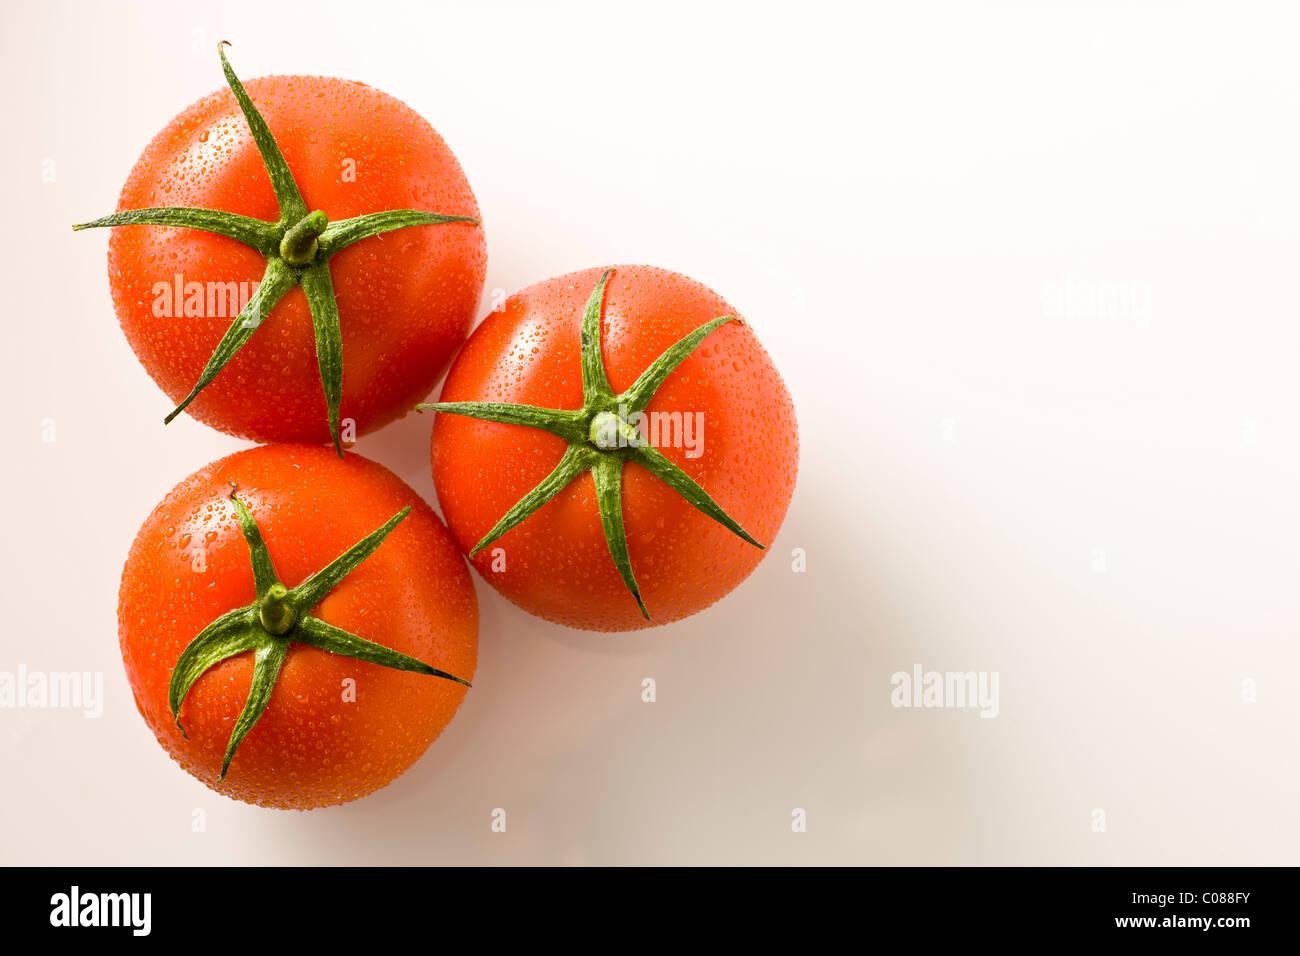 Vid tomates frescos sobre un fondo blanco. Imagen De Stock